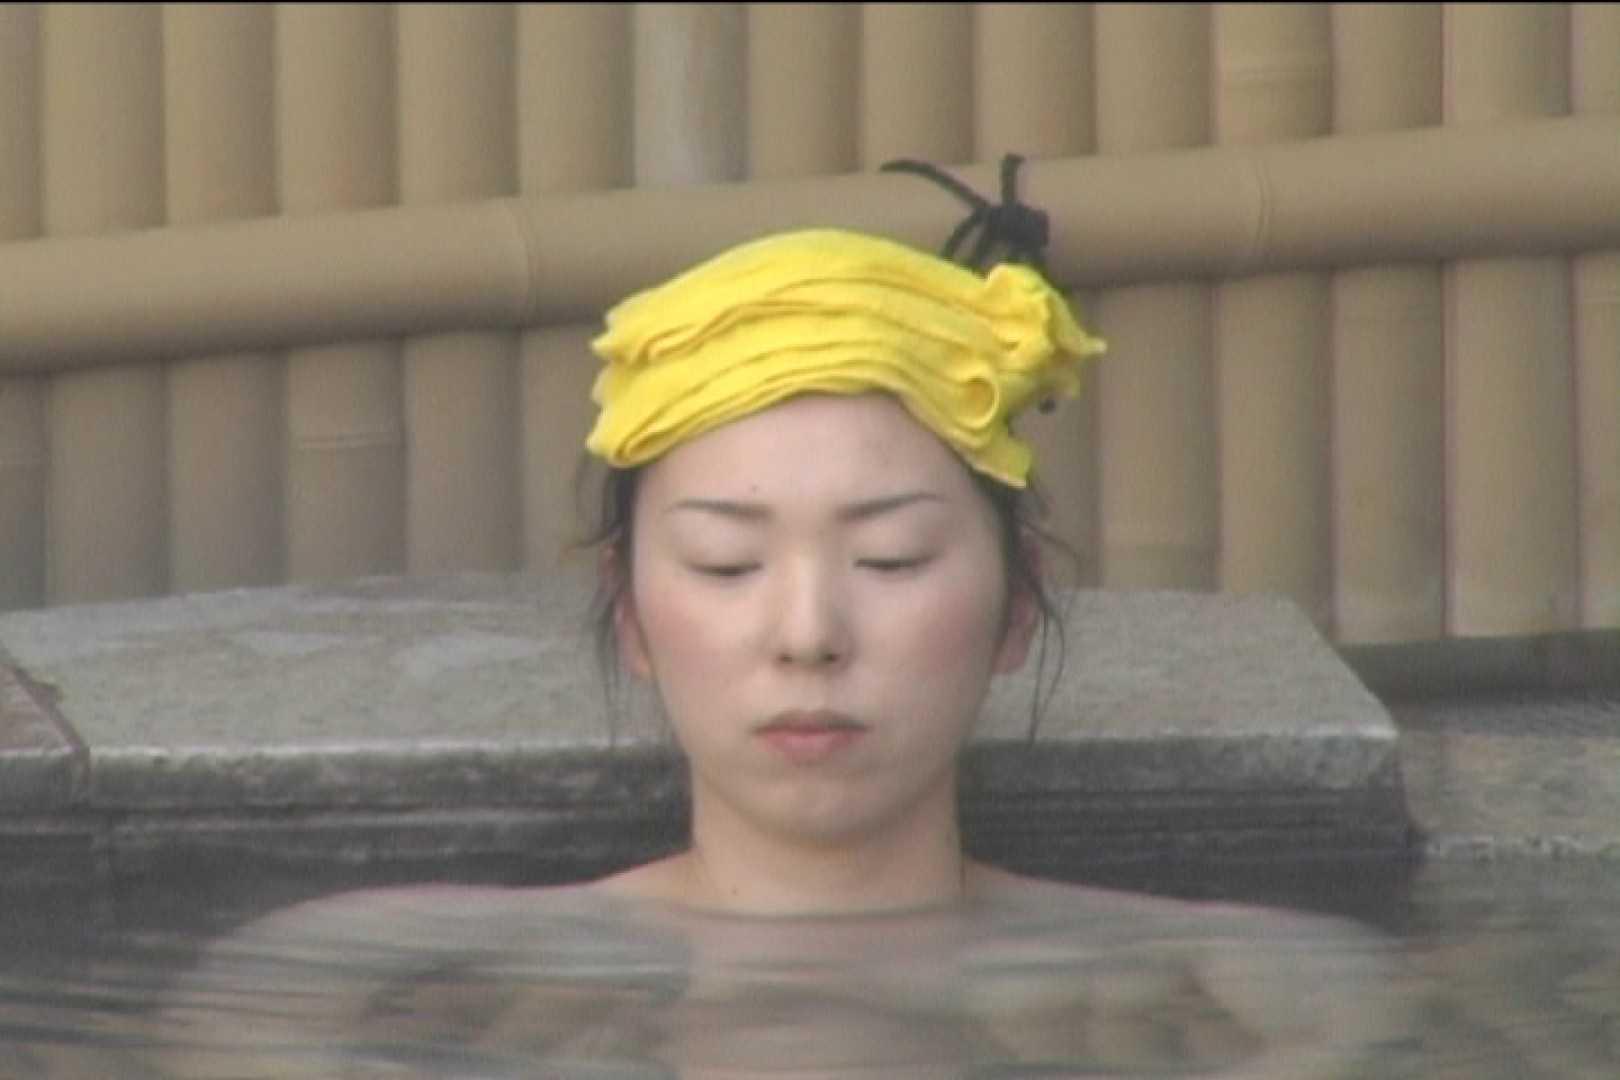 Aquaな露天風呂Vol.529 盗撮映像  51Pix 23